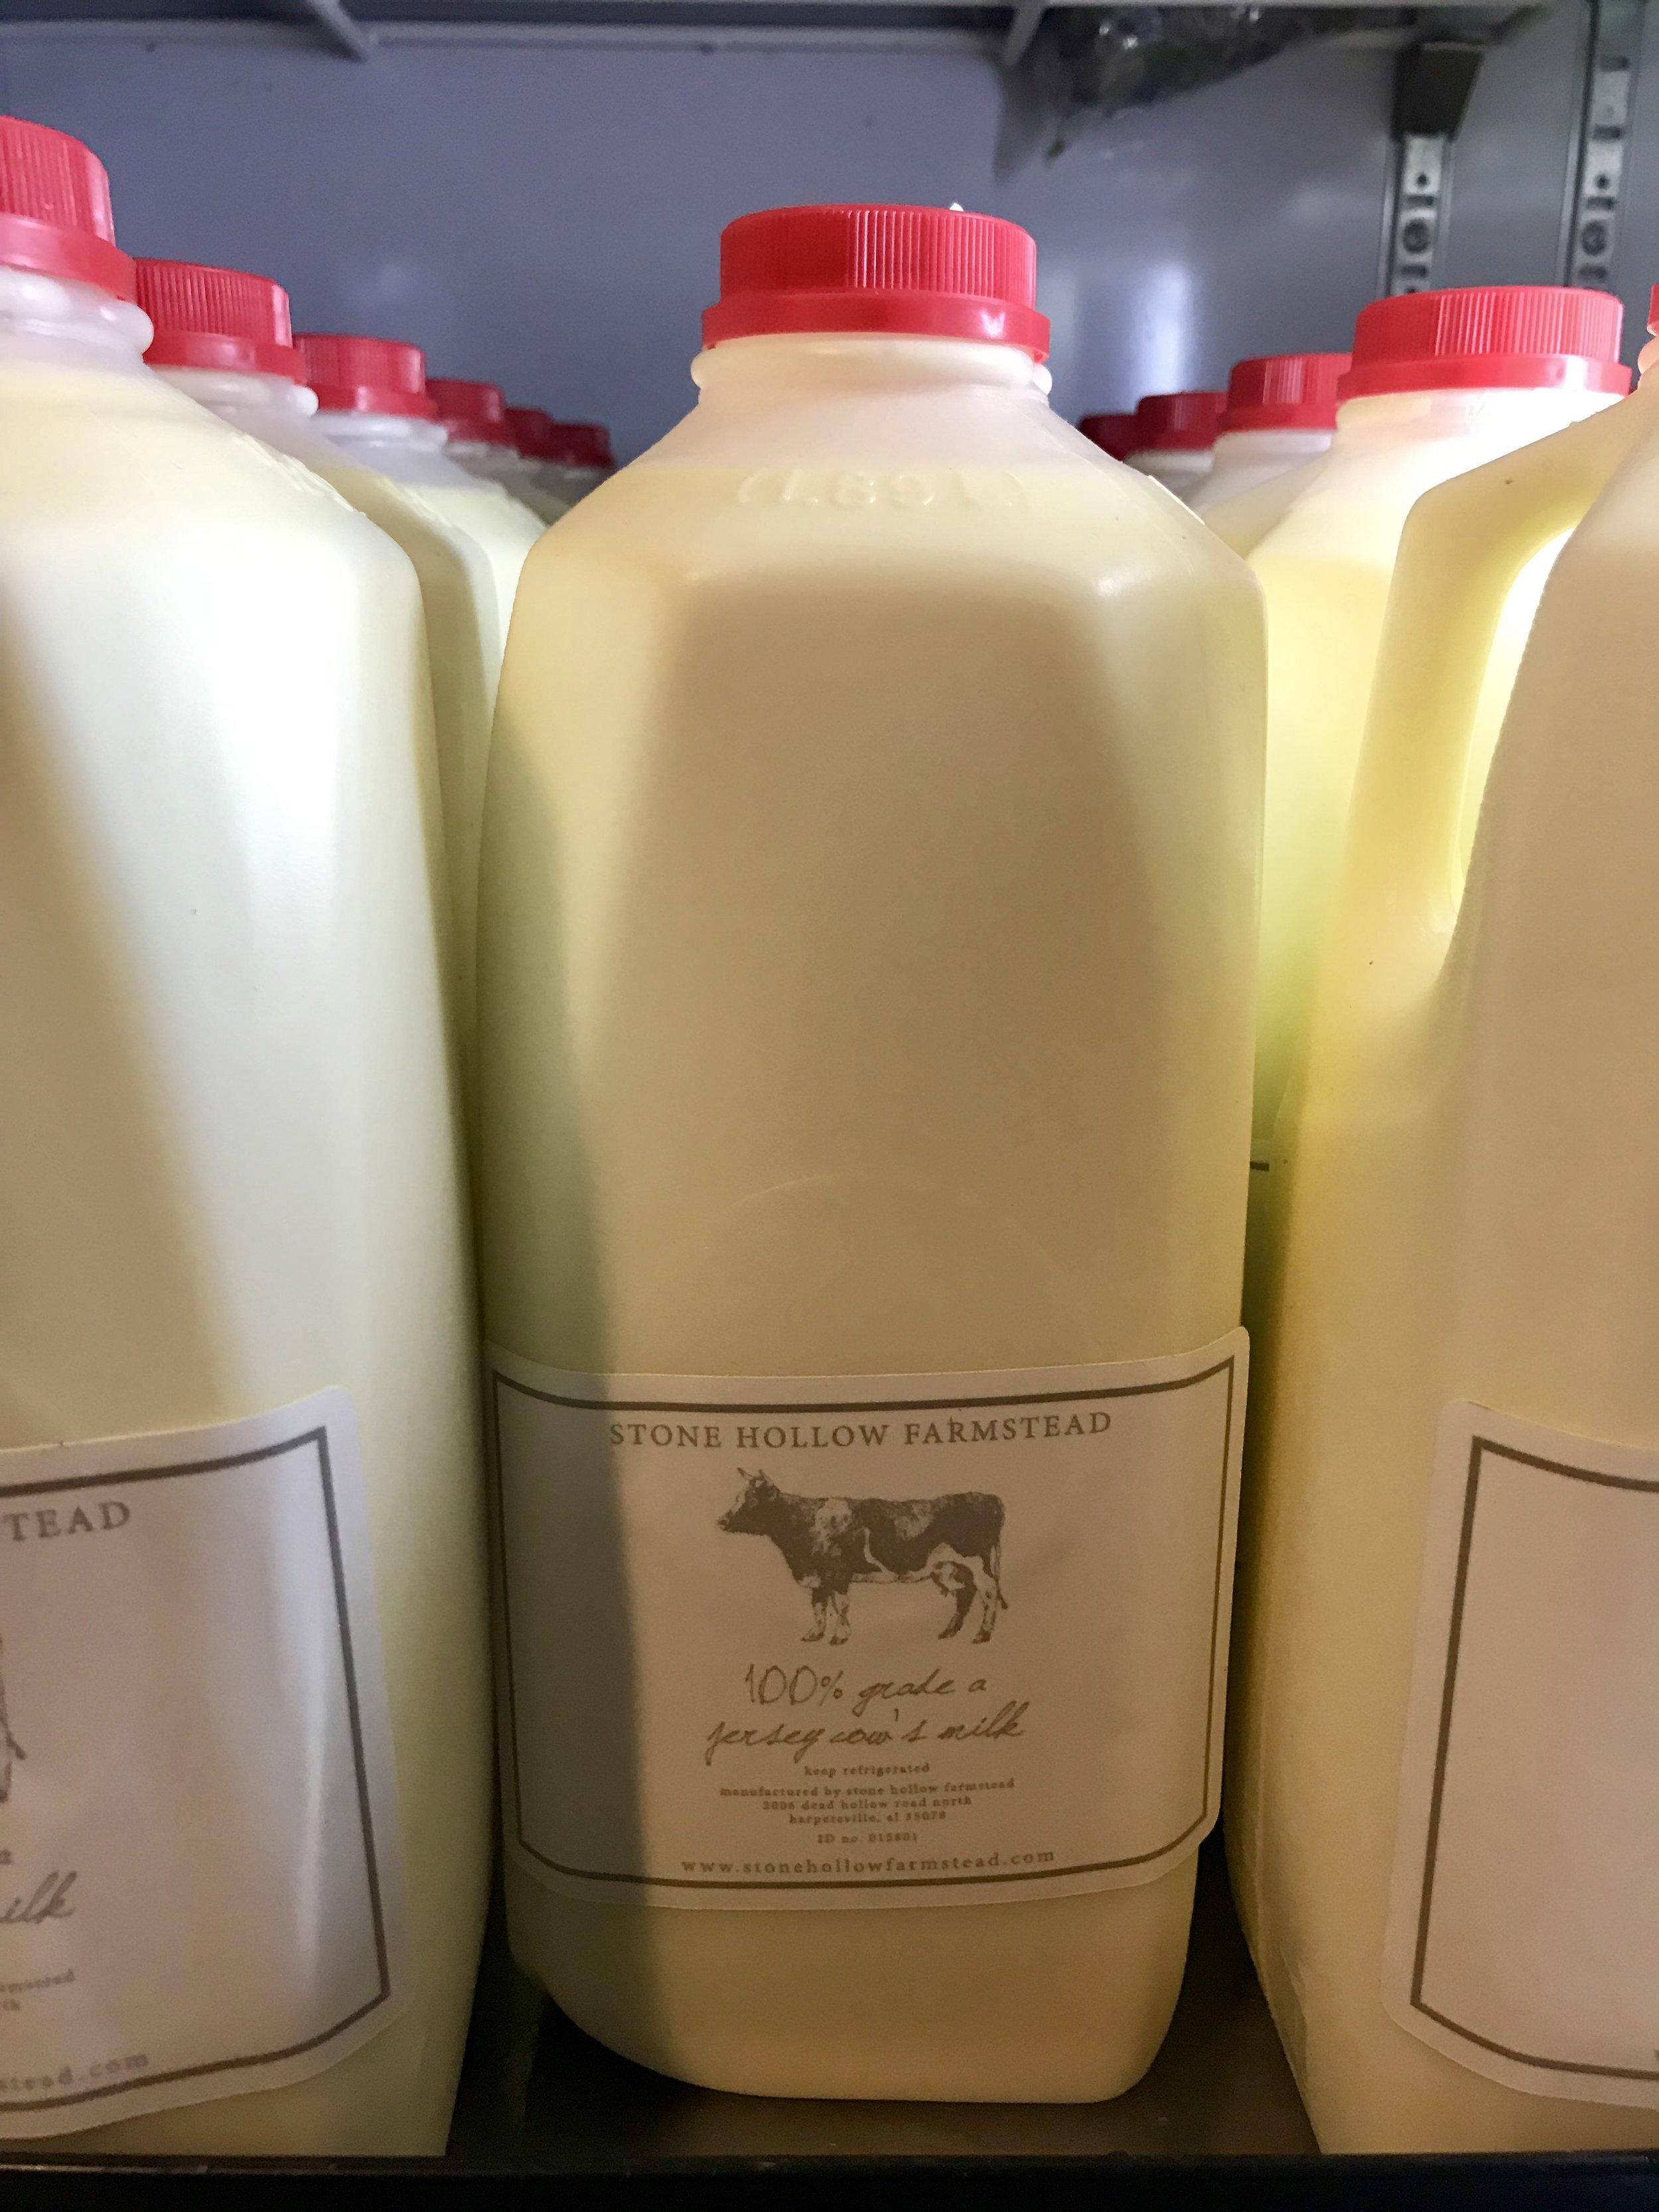 Whole Milk /  Stone Hollow Farmstead